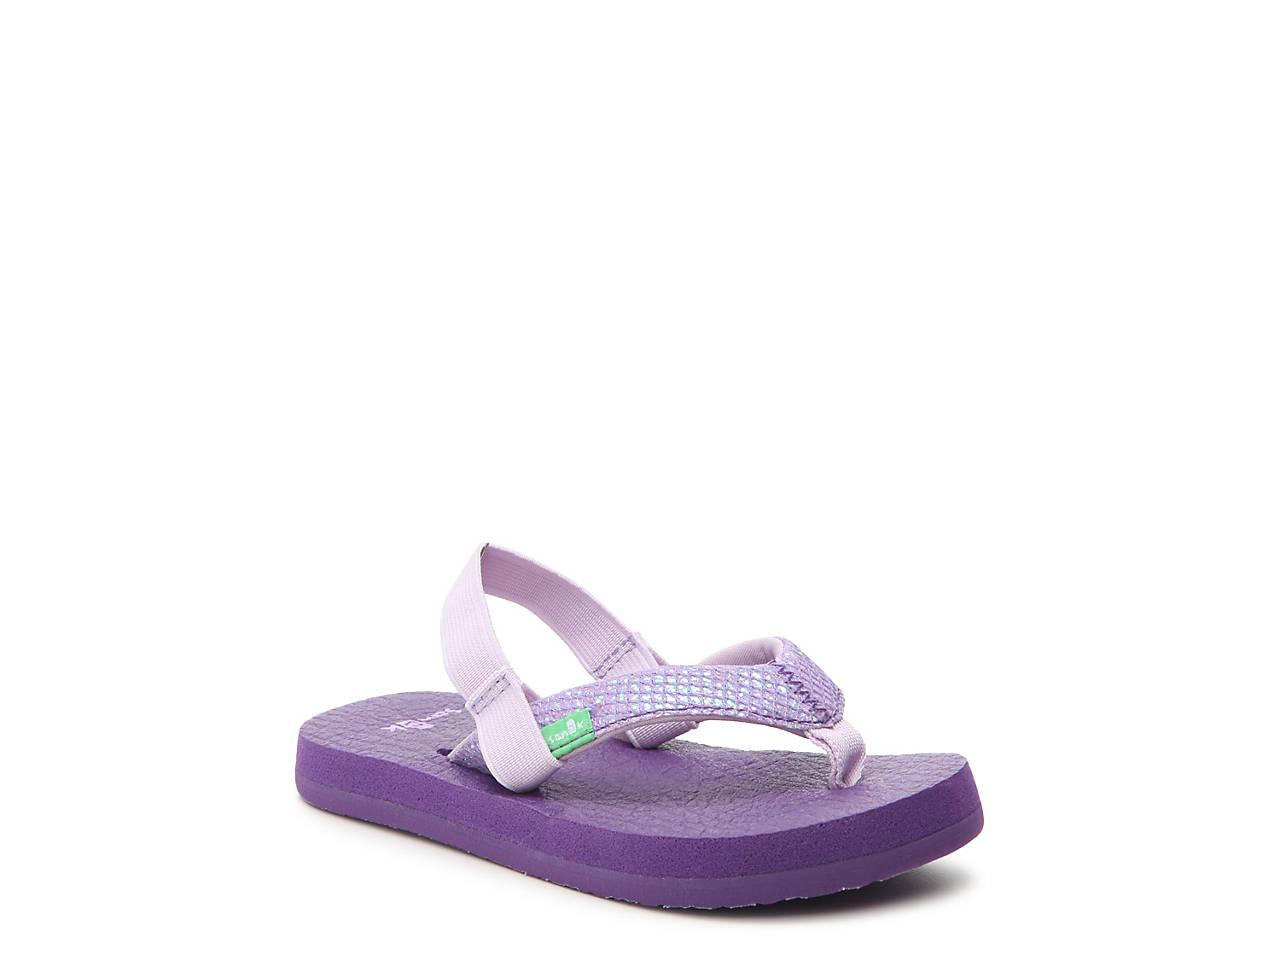 fb84451cf6ce Sanuk Yoga Glitter Toddler Flip Flop Kids Shoes